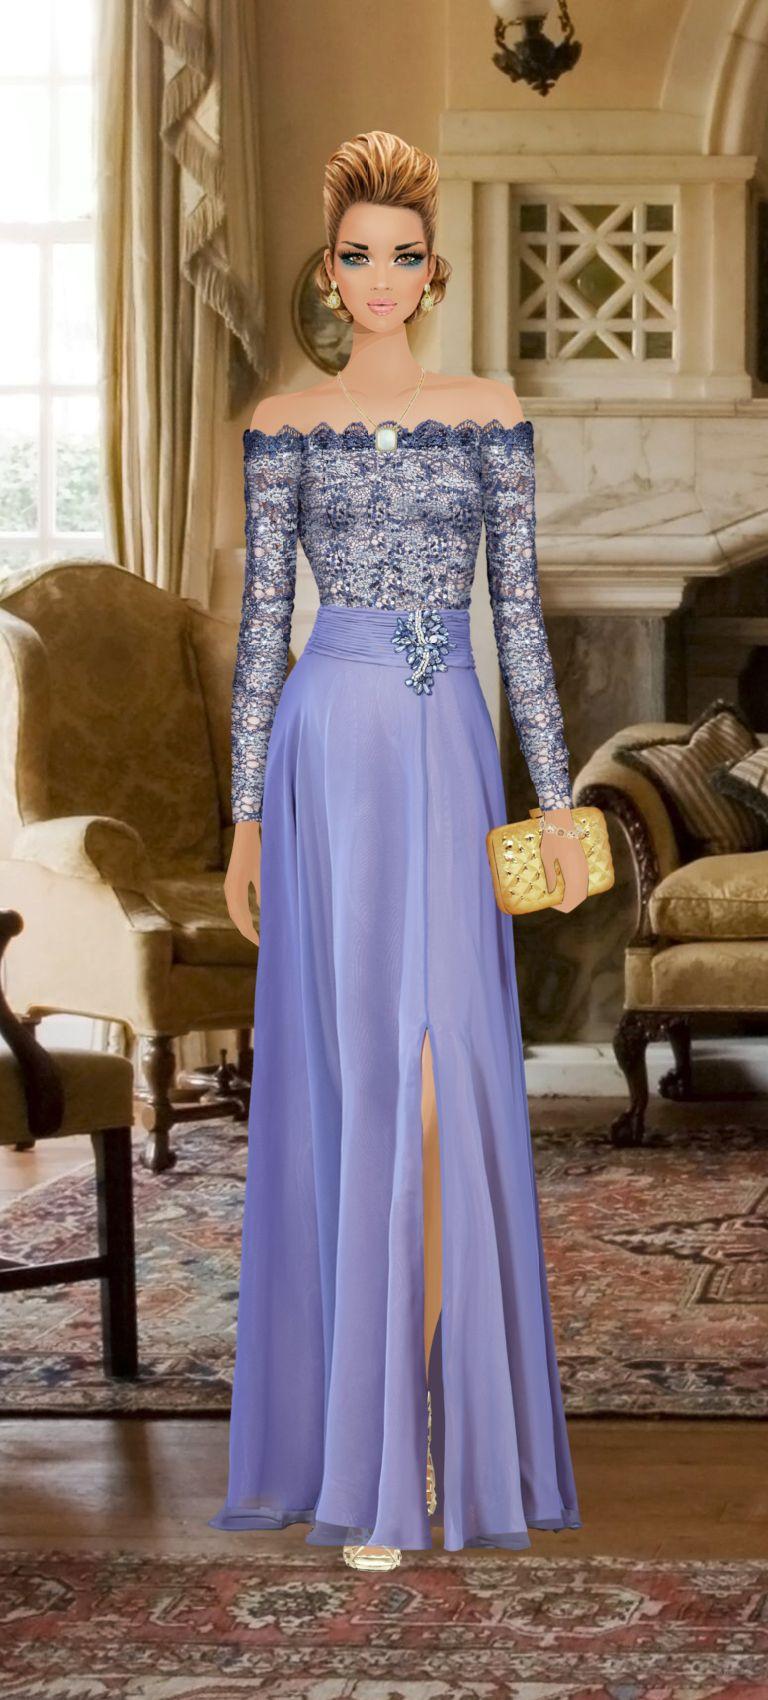 Fashion Game | Fashion game 4 | Pinterest | Croquis, Vestidos de ...